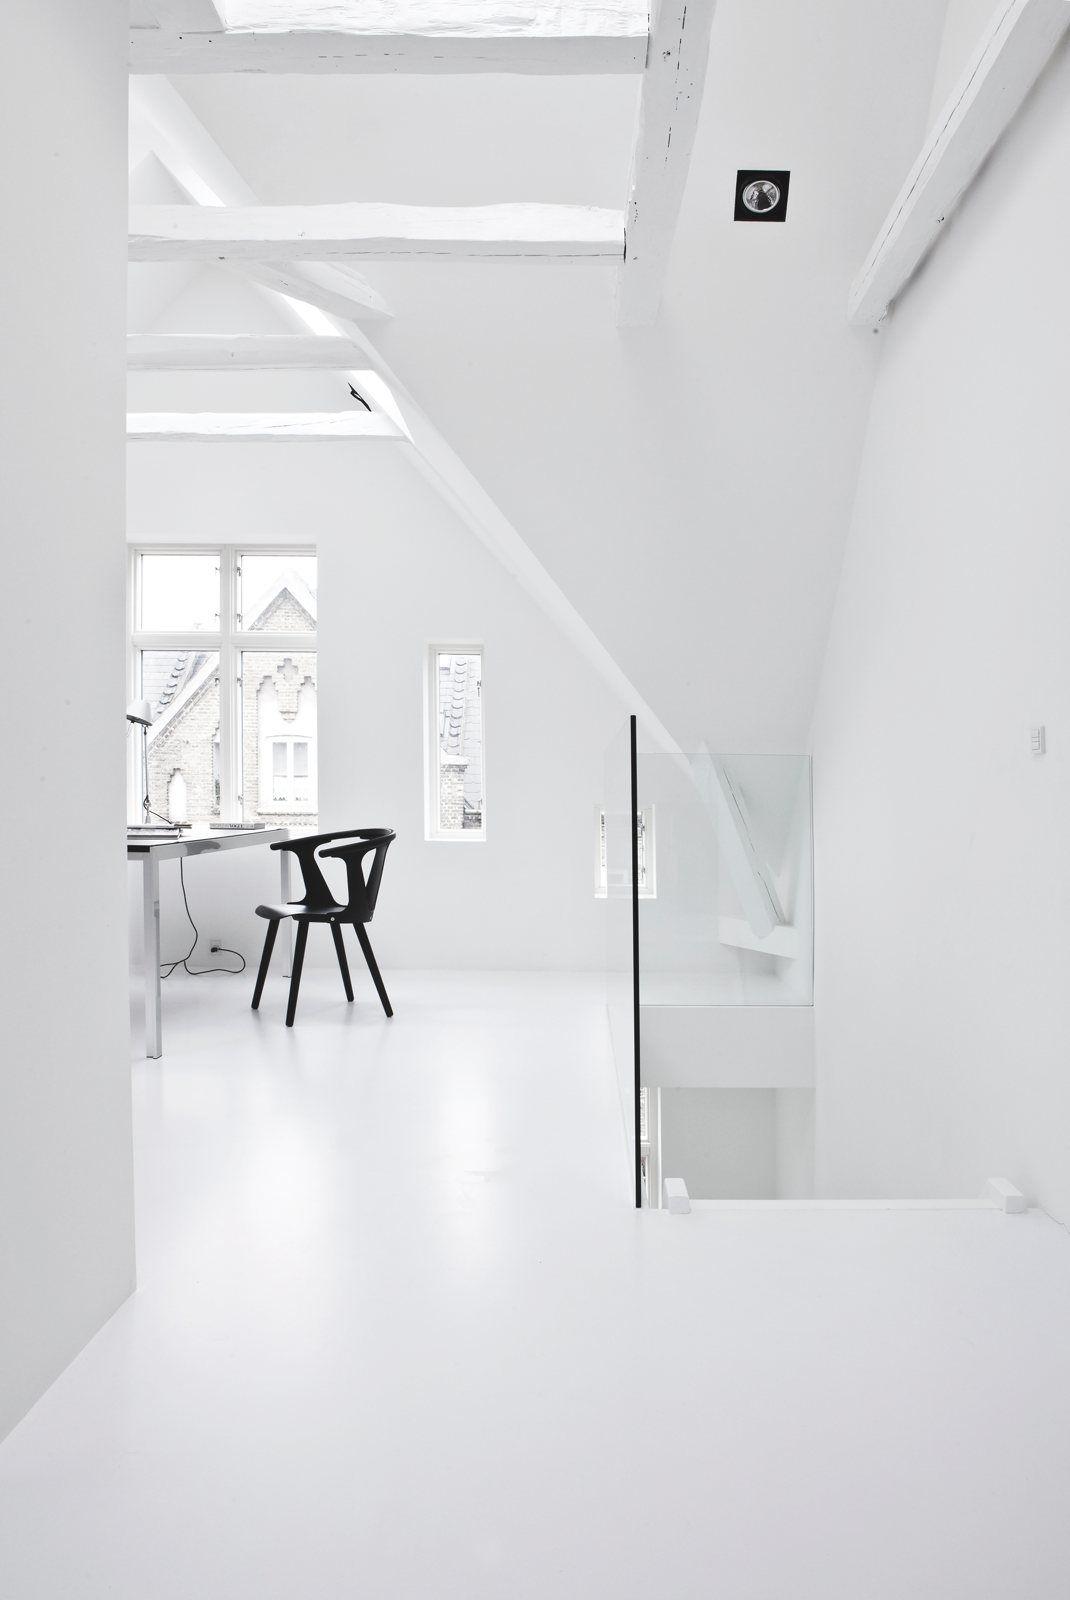 White attic workspace copenhagen townhouse ii by norm architects jonas bjerre poulsen